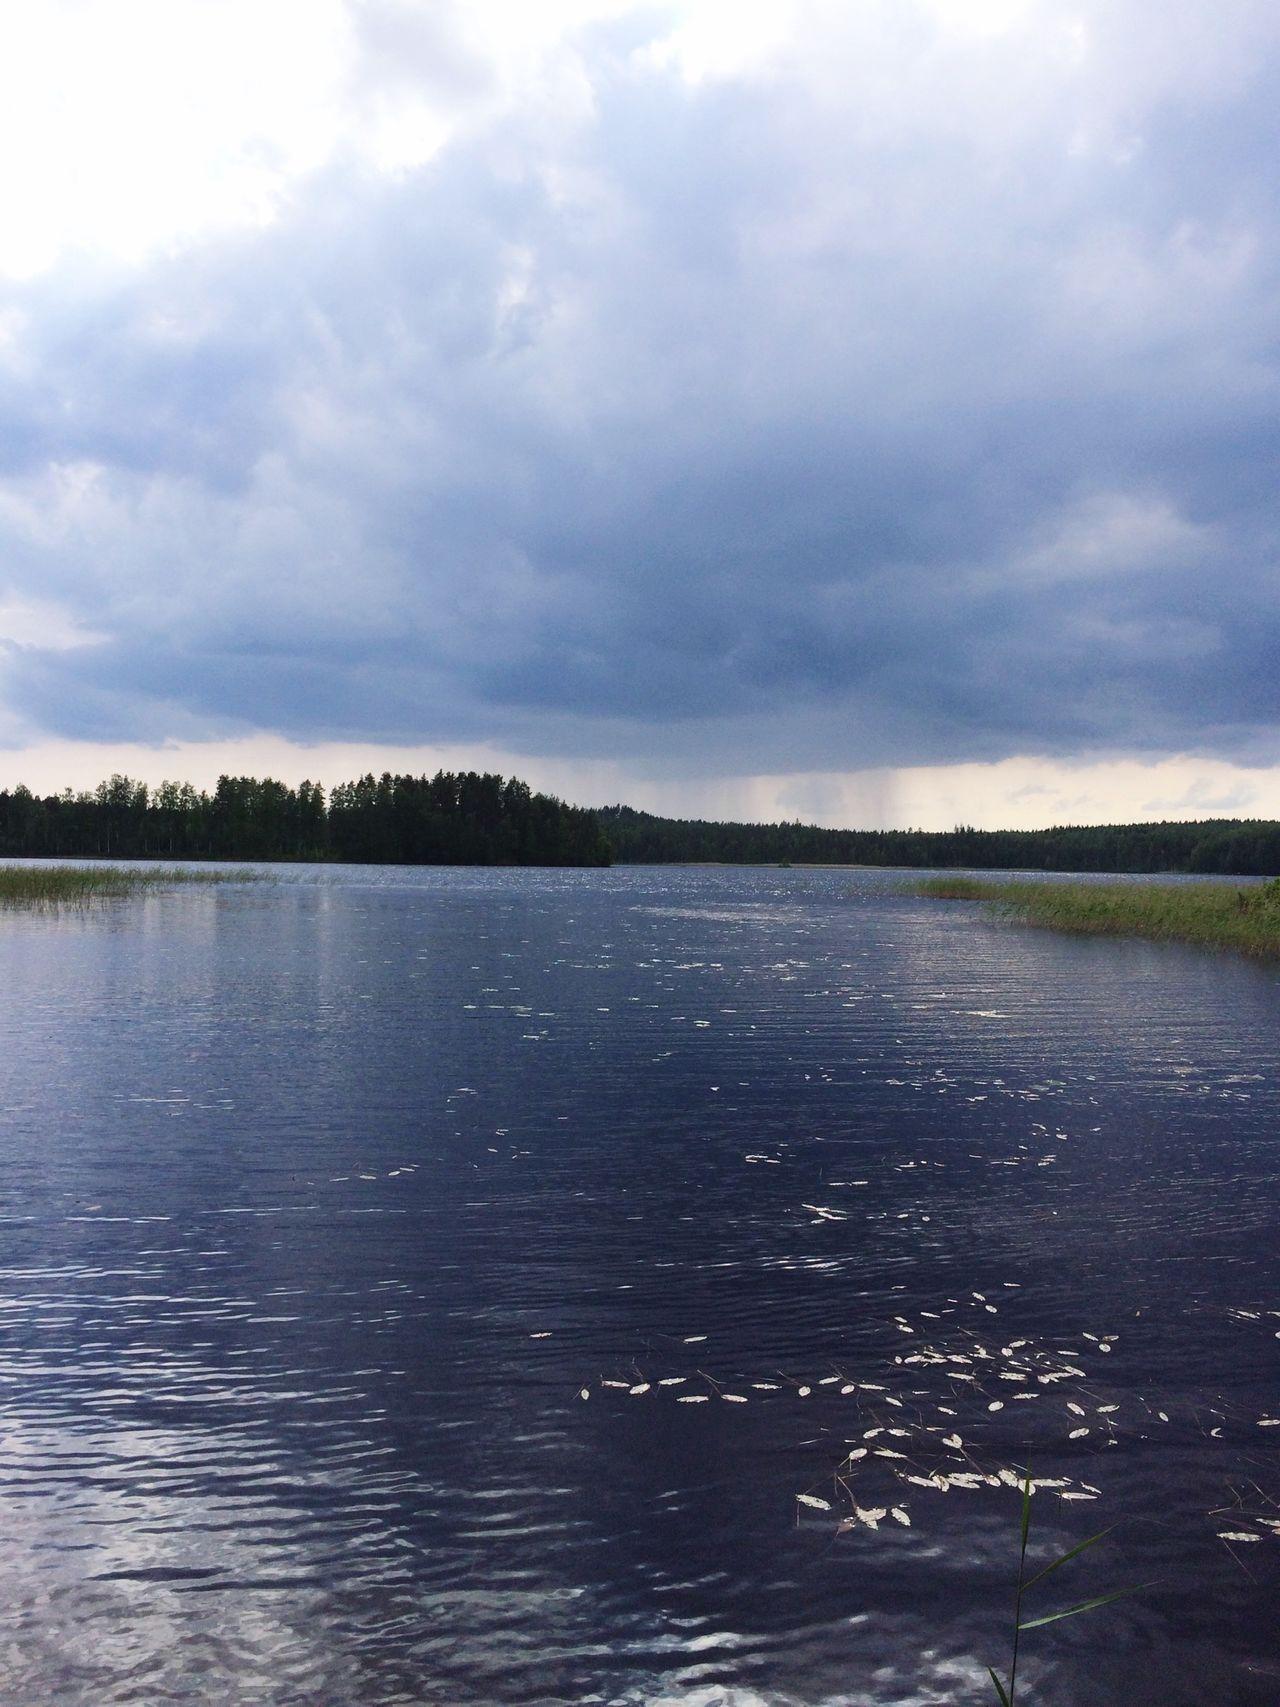 Midsummer Eve Summer Landscape Lake View Juhannus Summercottage Finland Nature